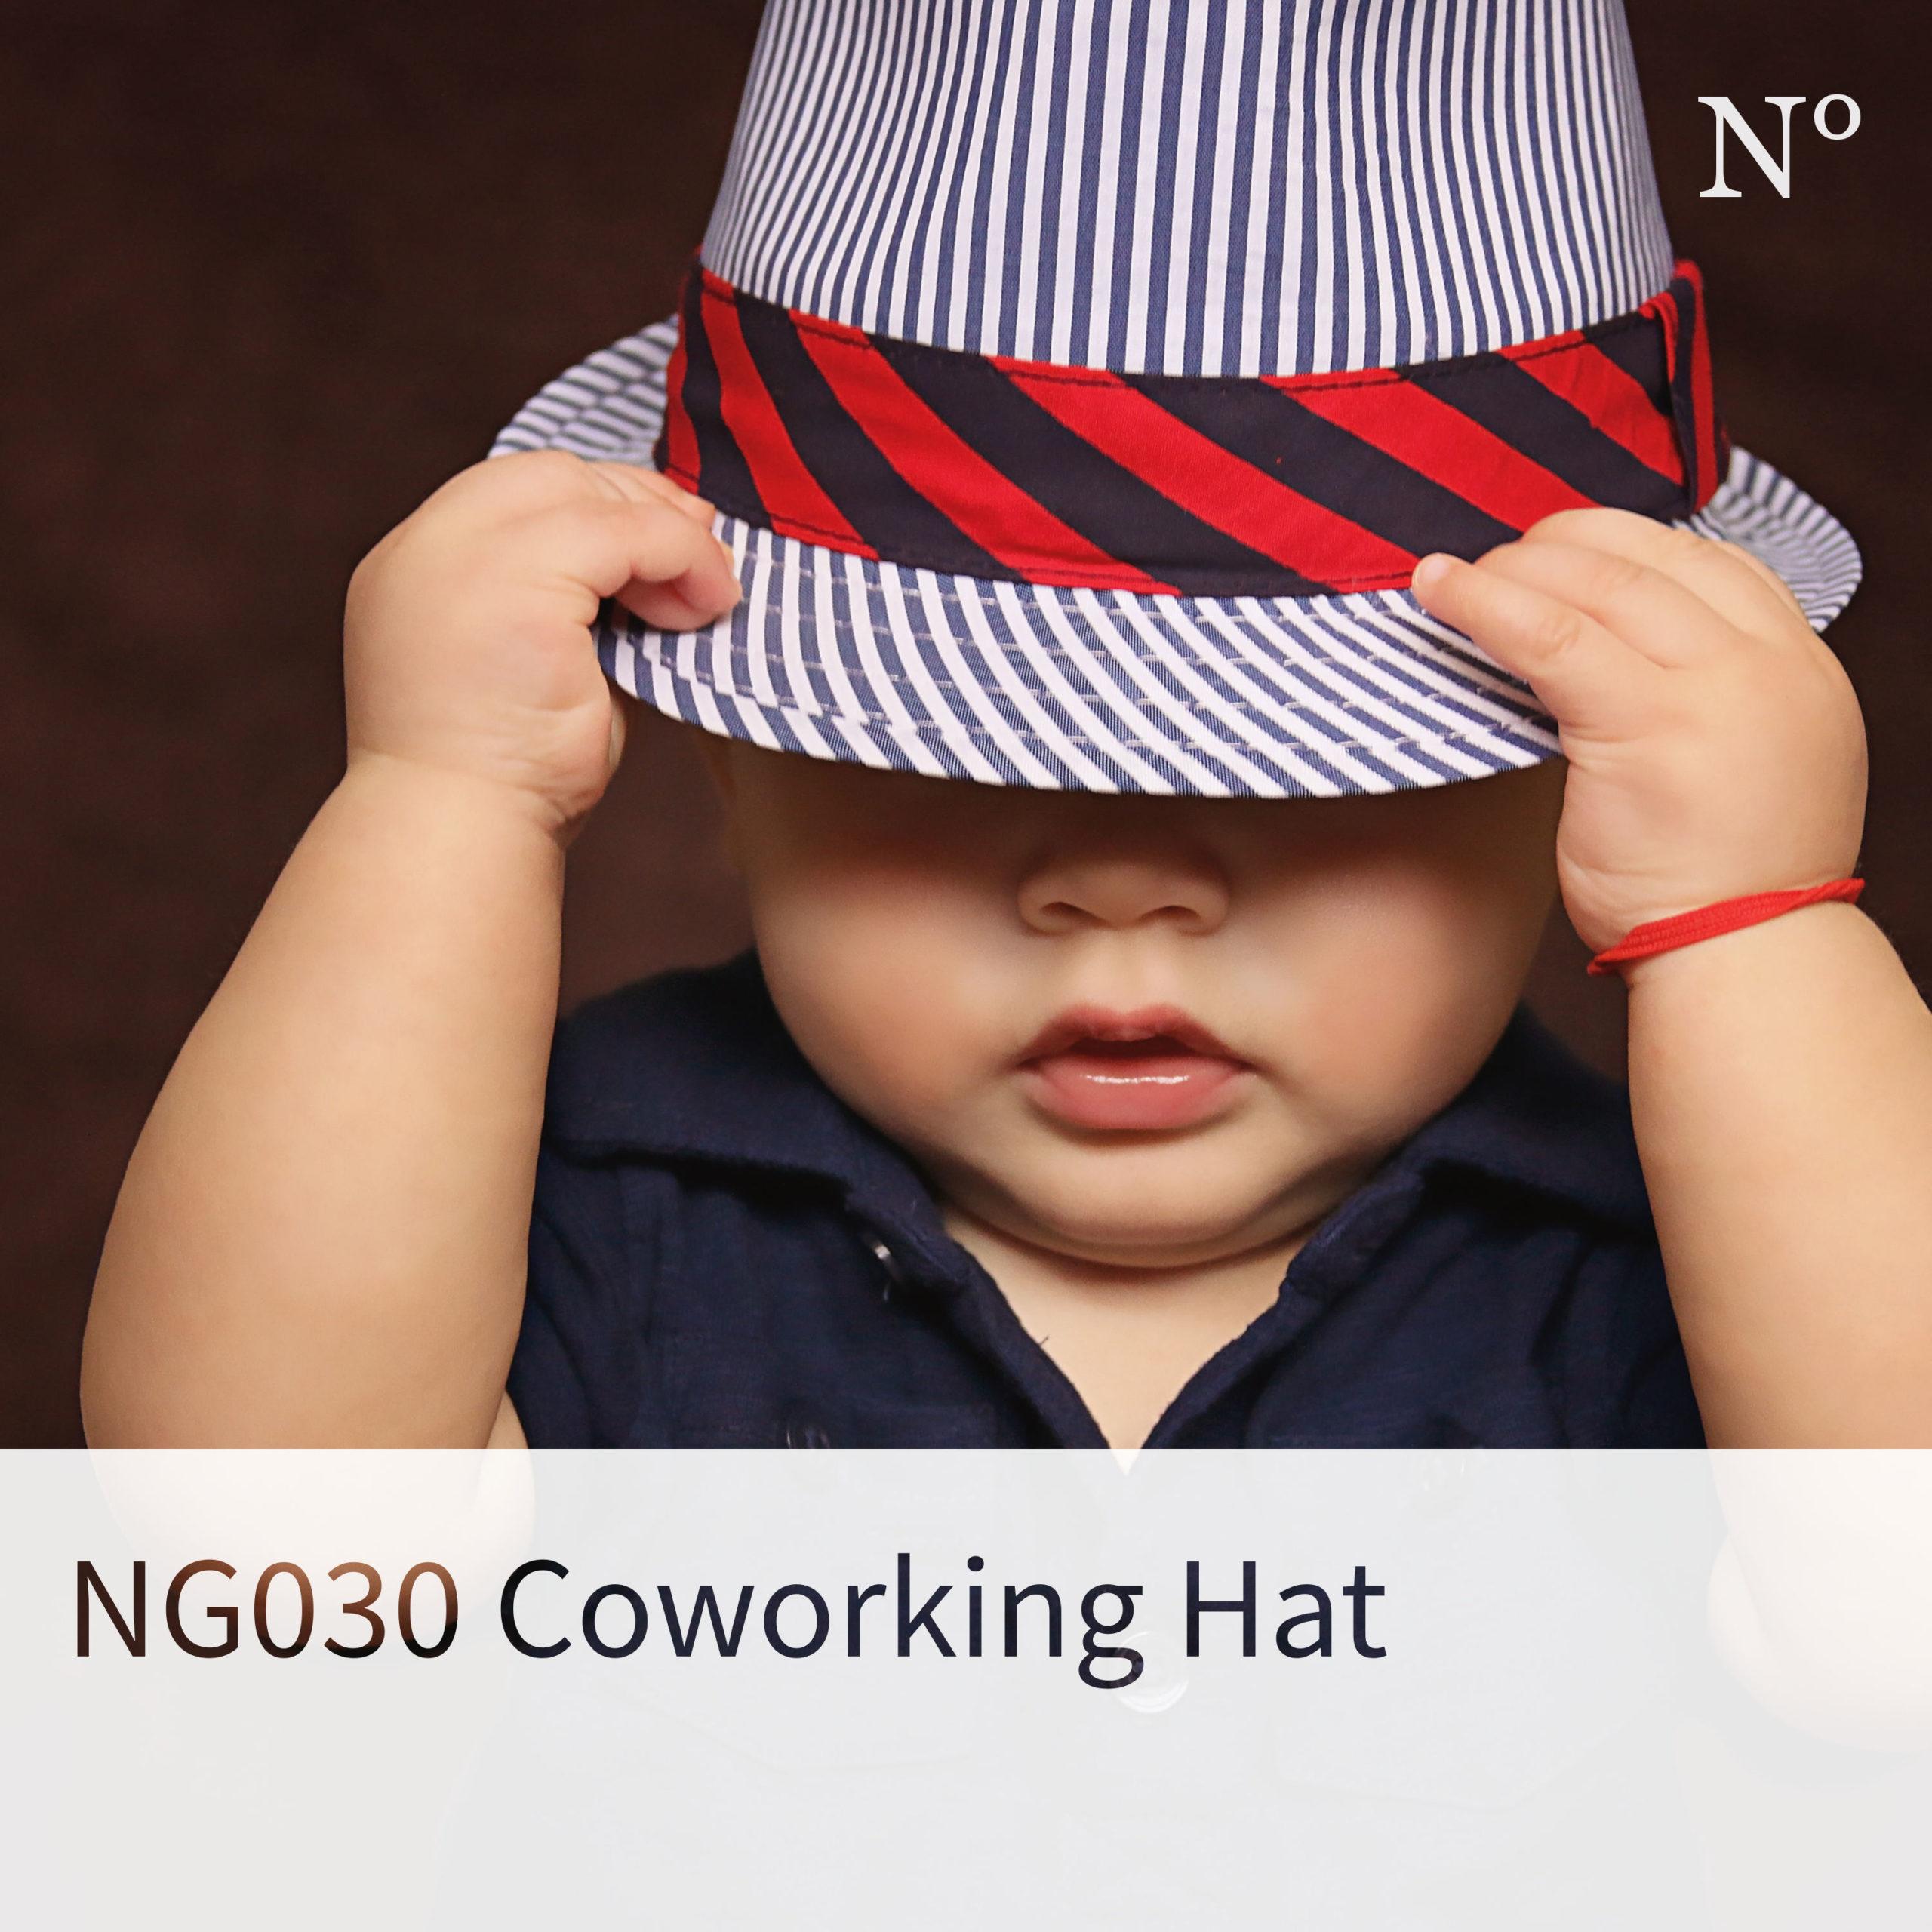 NG030 Coworking Hat